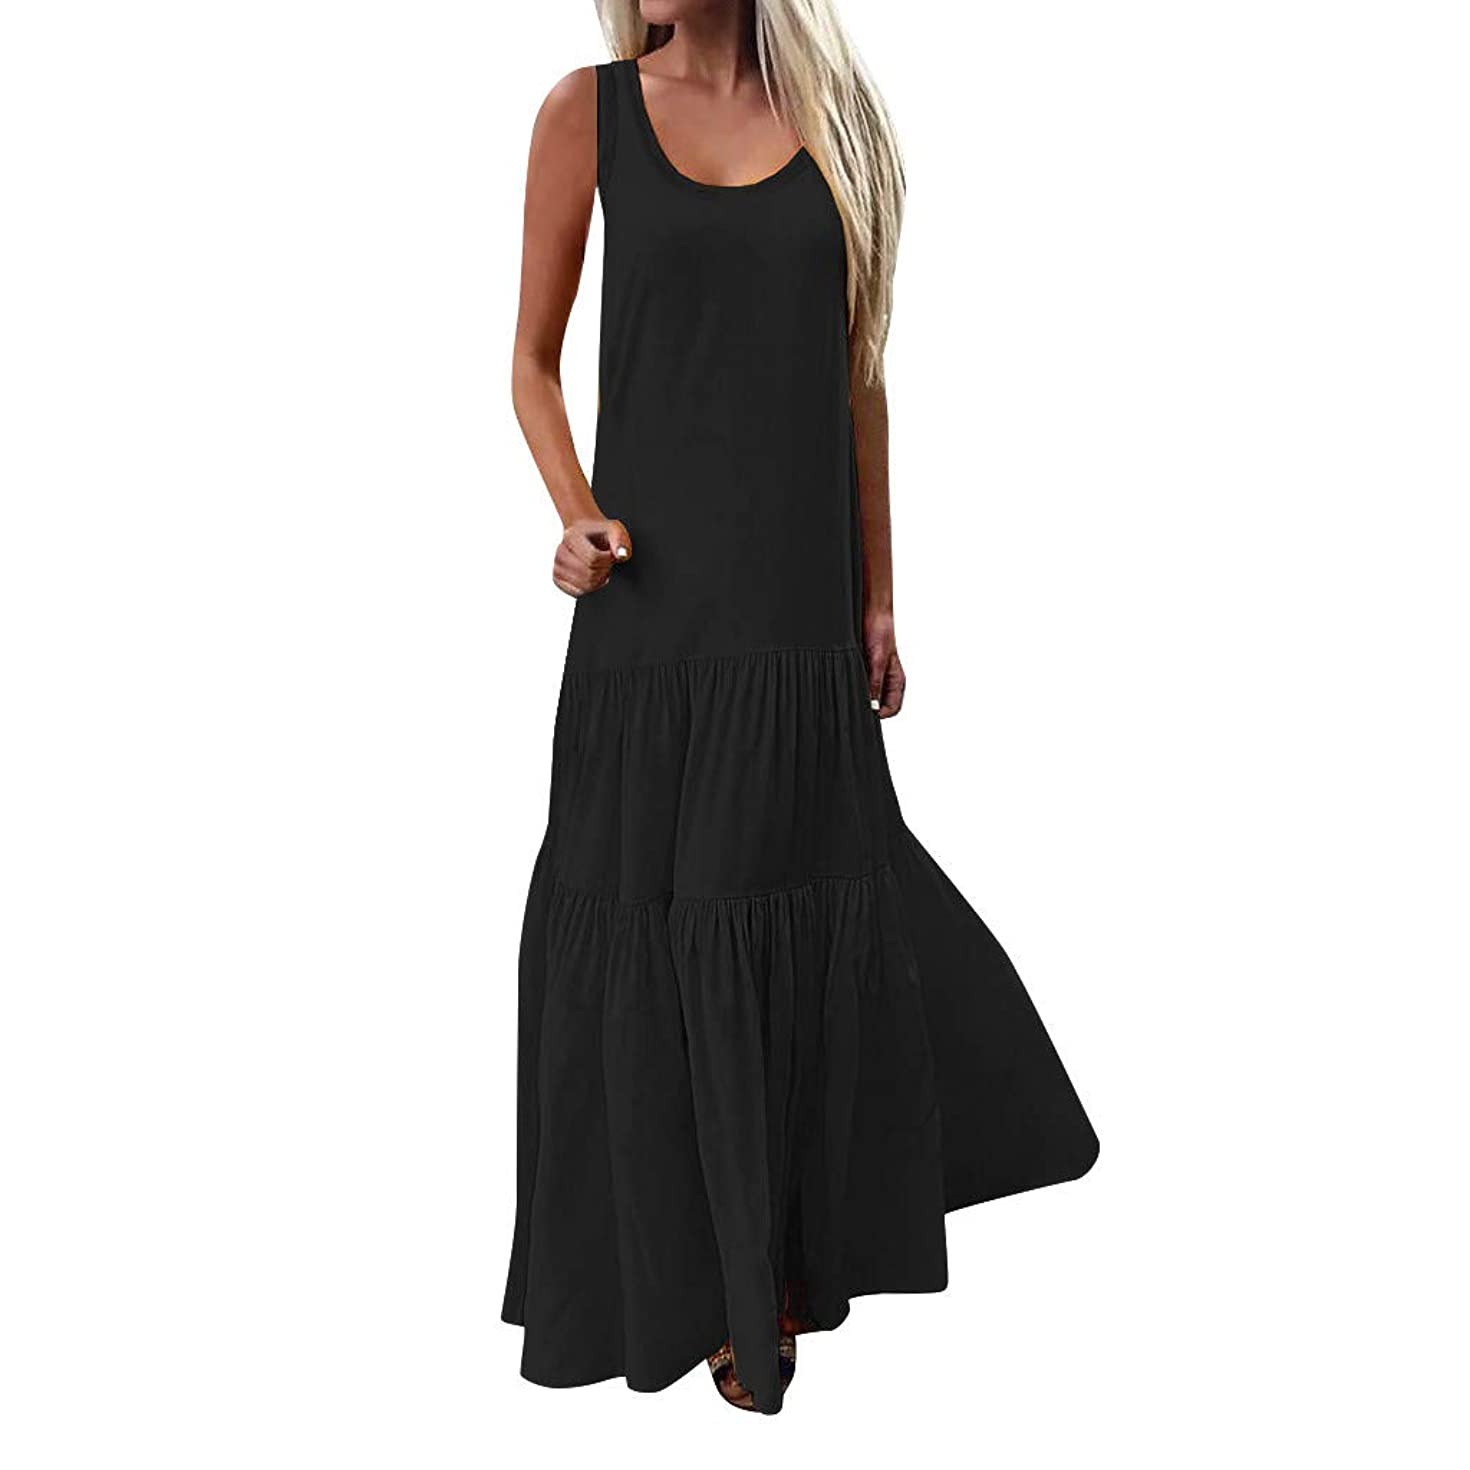 Sunhusing Women's Bohemian Casual Wind Long Maxi Dress Sleeveless Low Cut Ruffles Baggy Floor-Length Dress